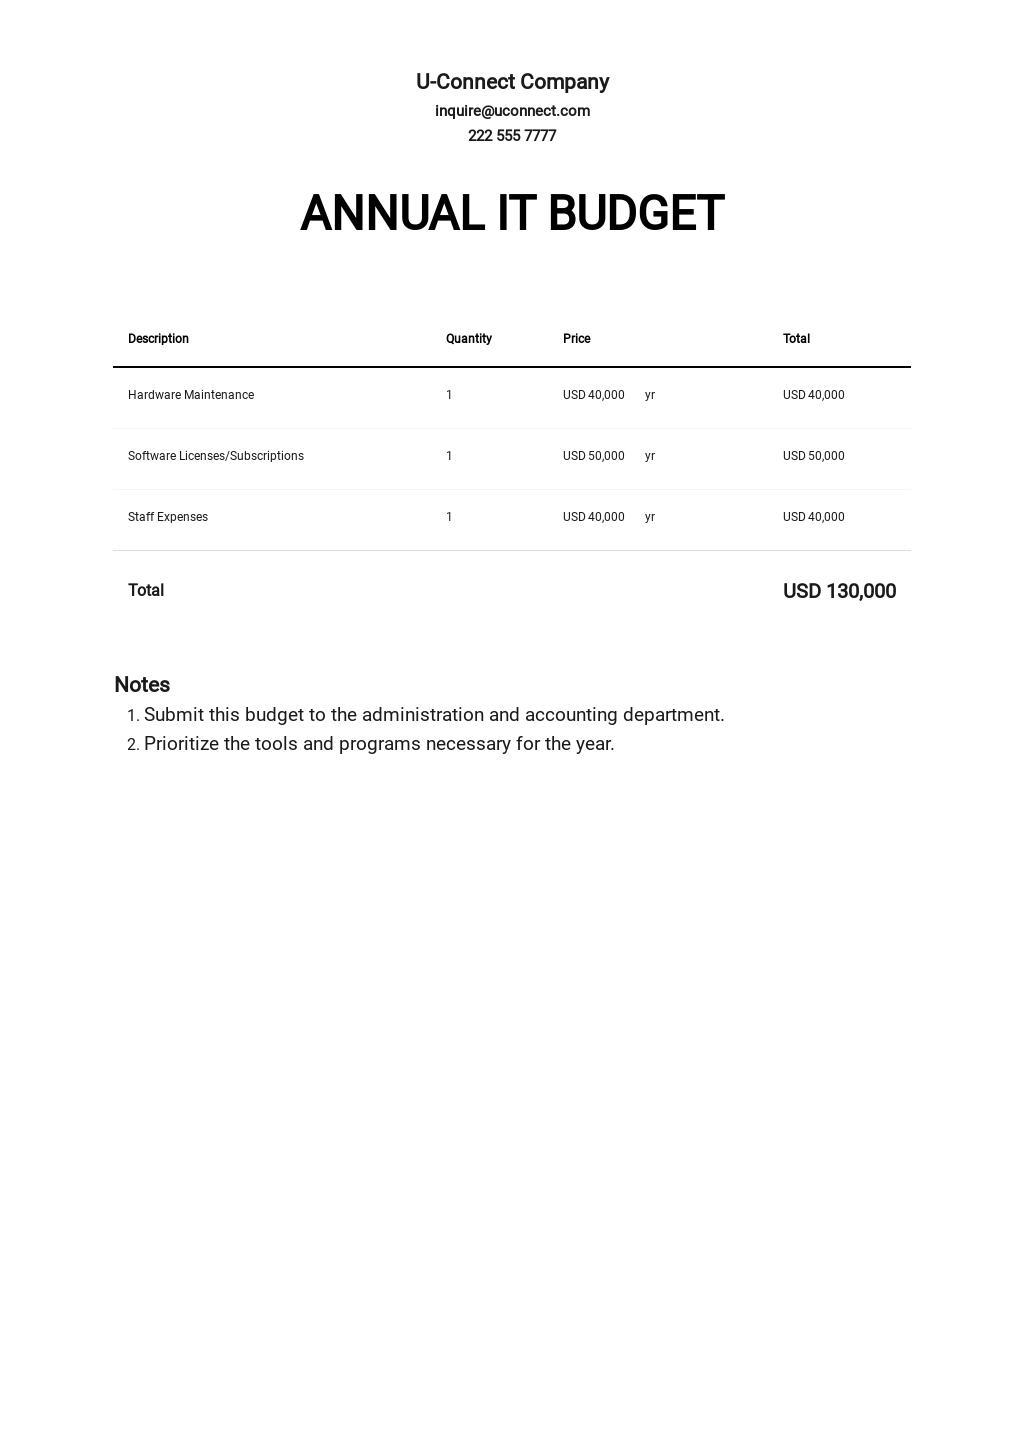 Annual IT Budget Template.jpe